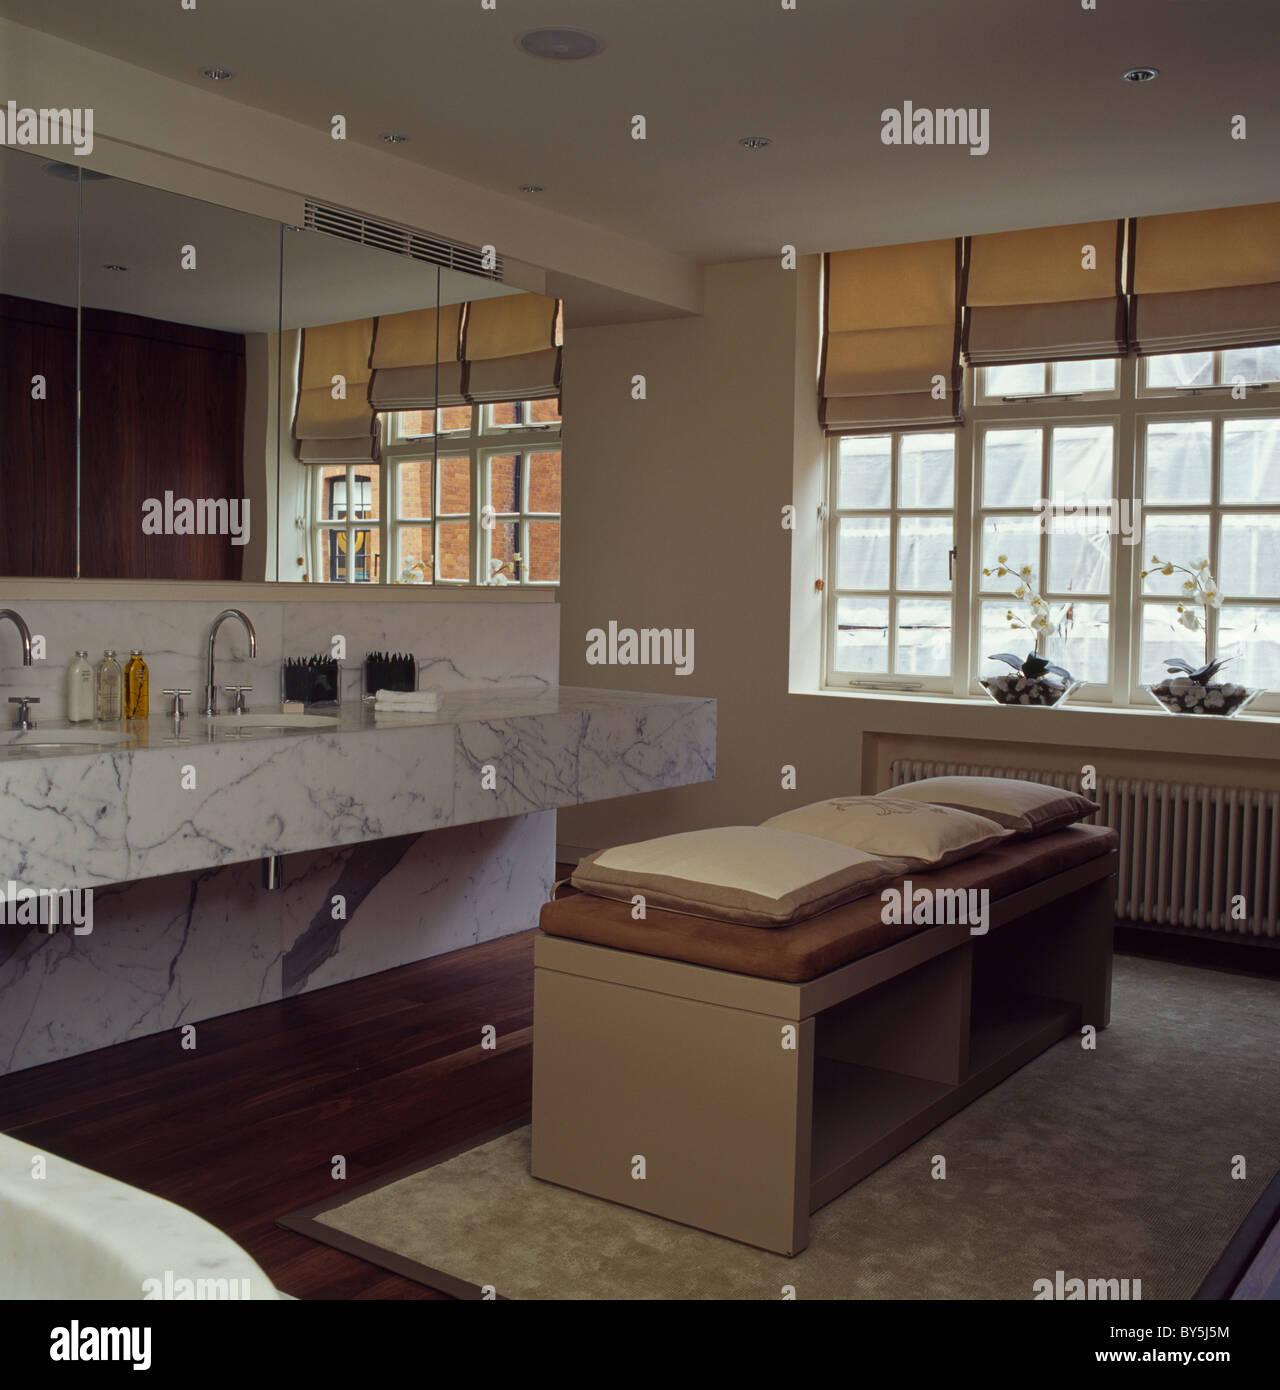 Large mirror above double basins in marble vanity unit in modern en-suite bathroom - Stock Image